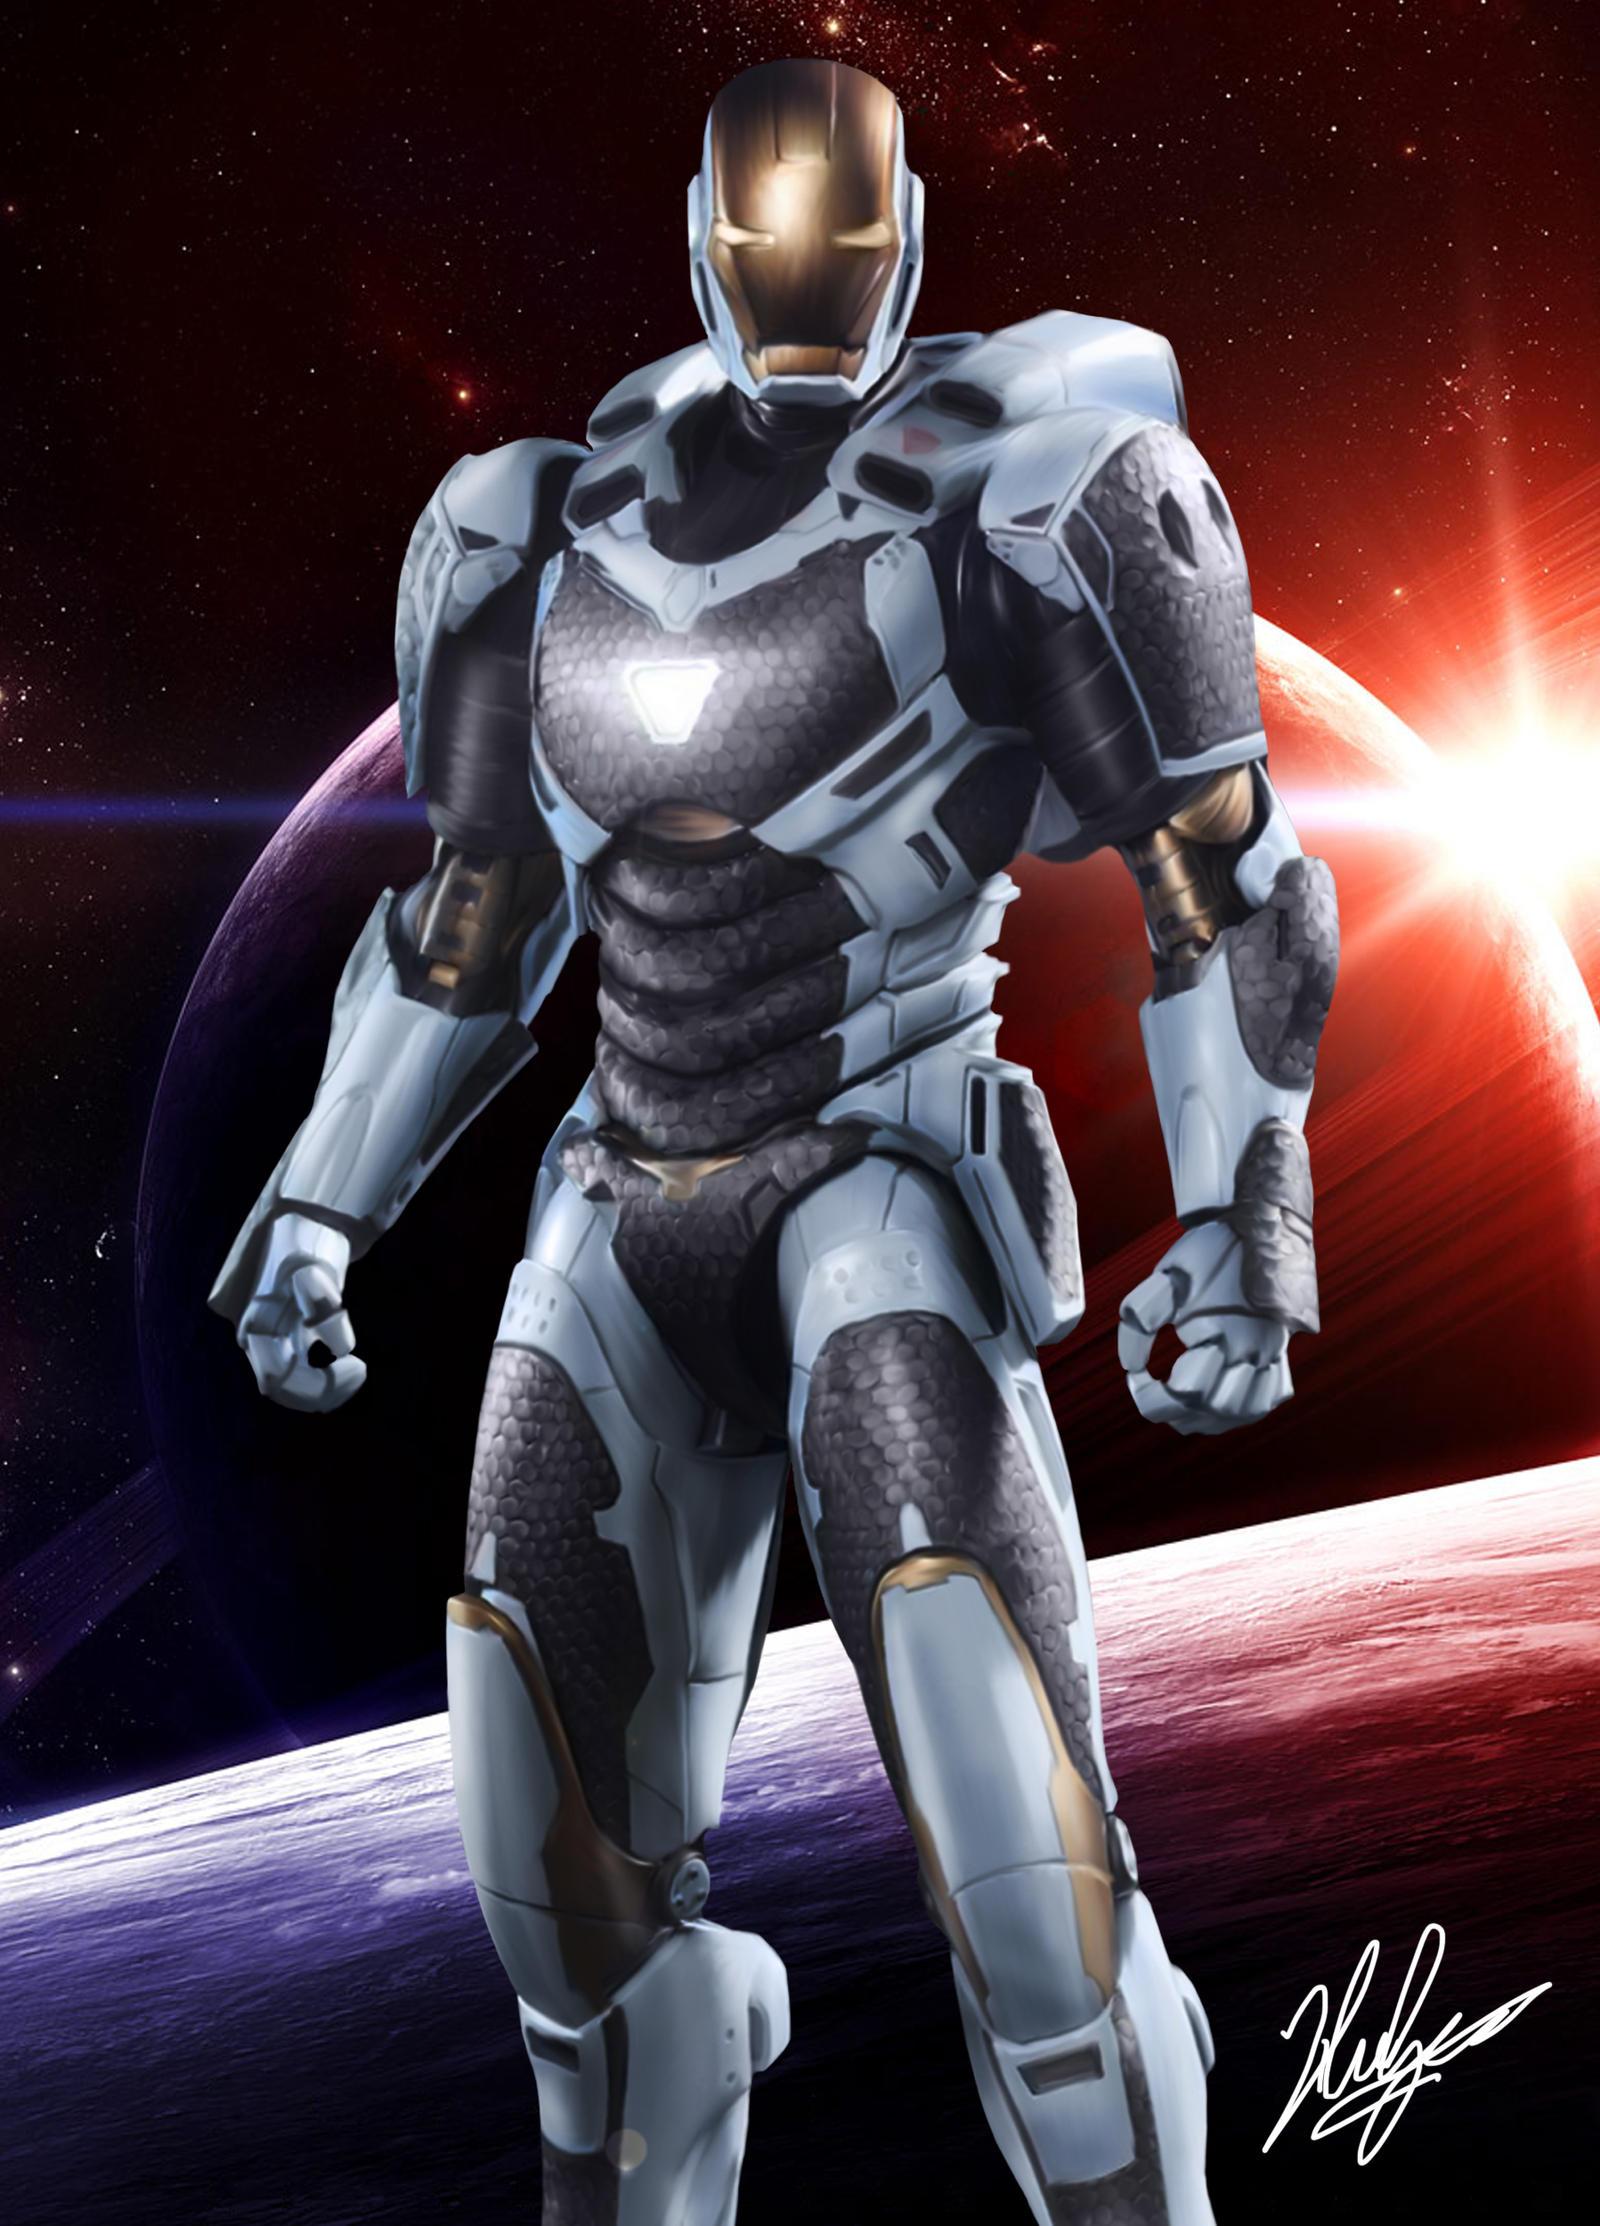 Iron Man Mark 39 - Starboost by neoyurin on DeviantArt